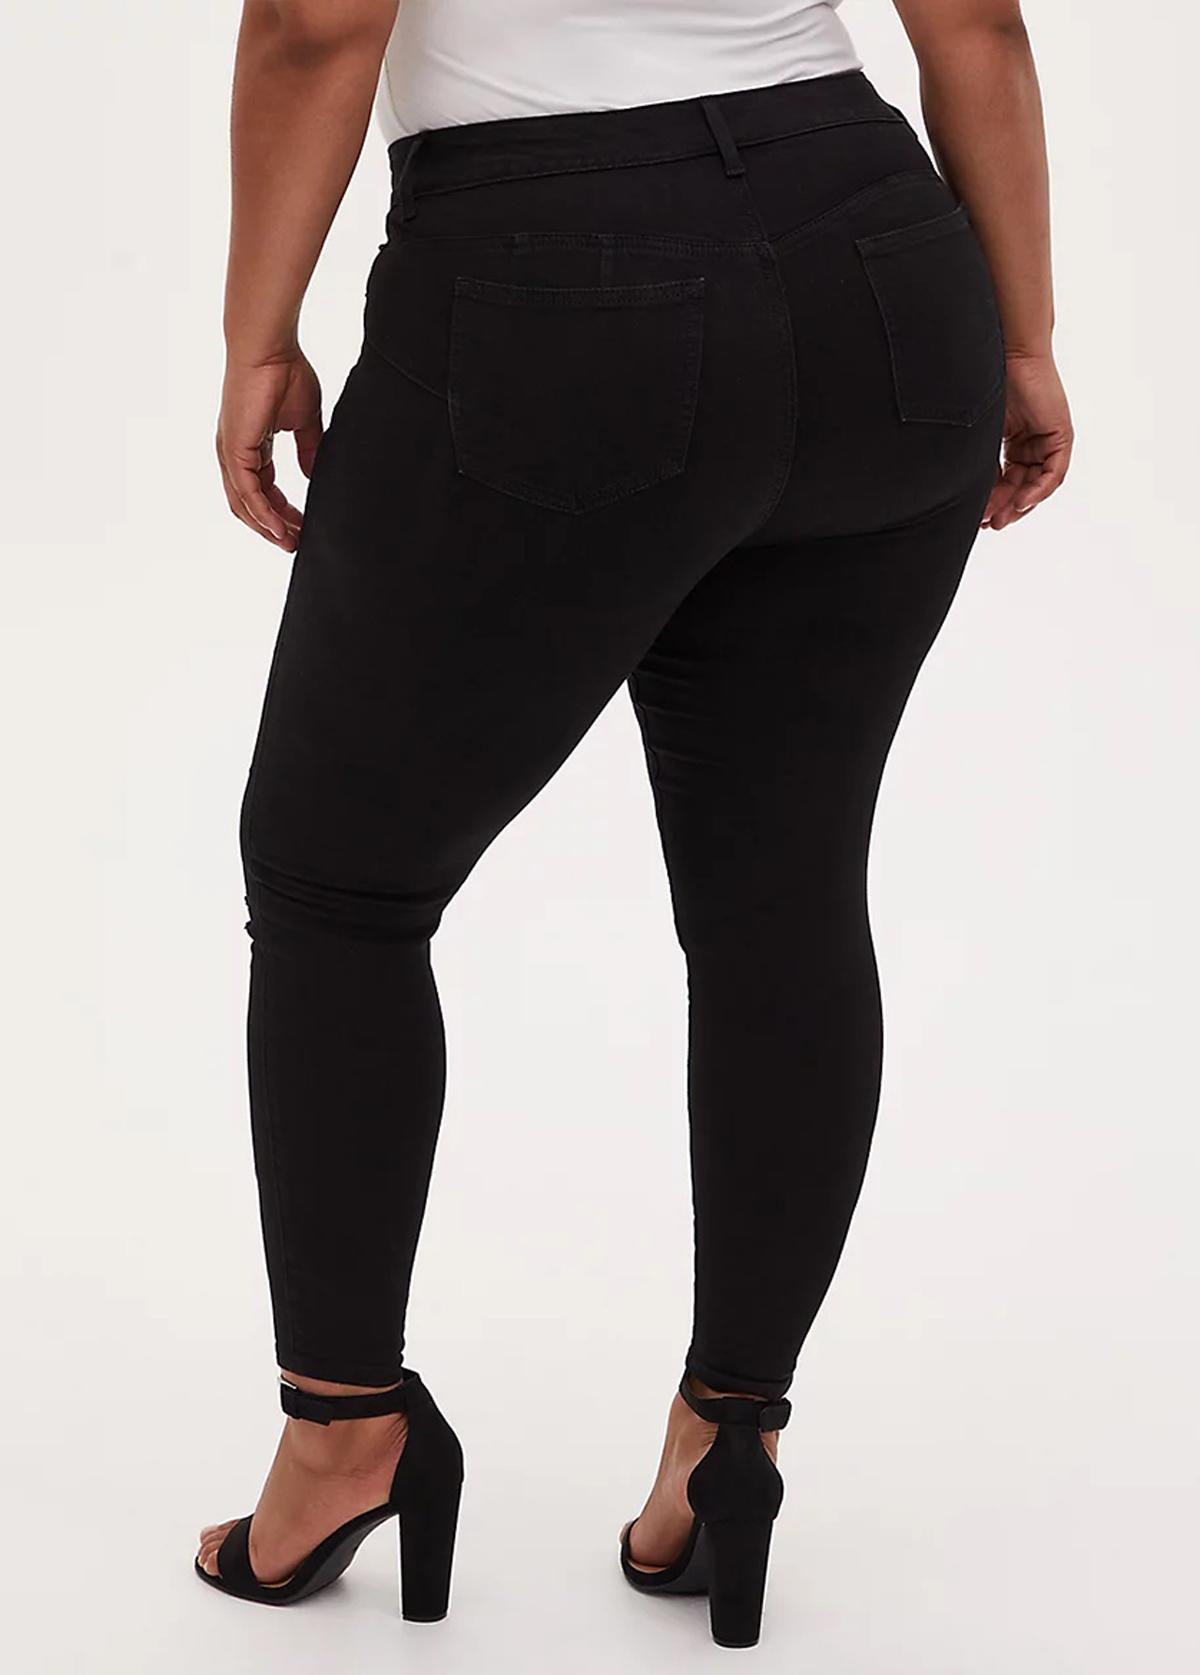 Shredded Black Skinny Plus Size Jeans